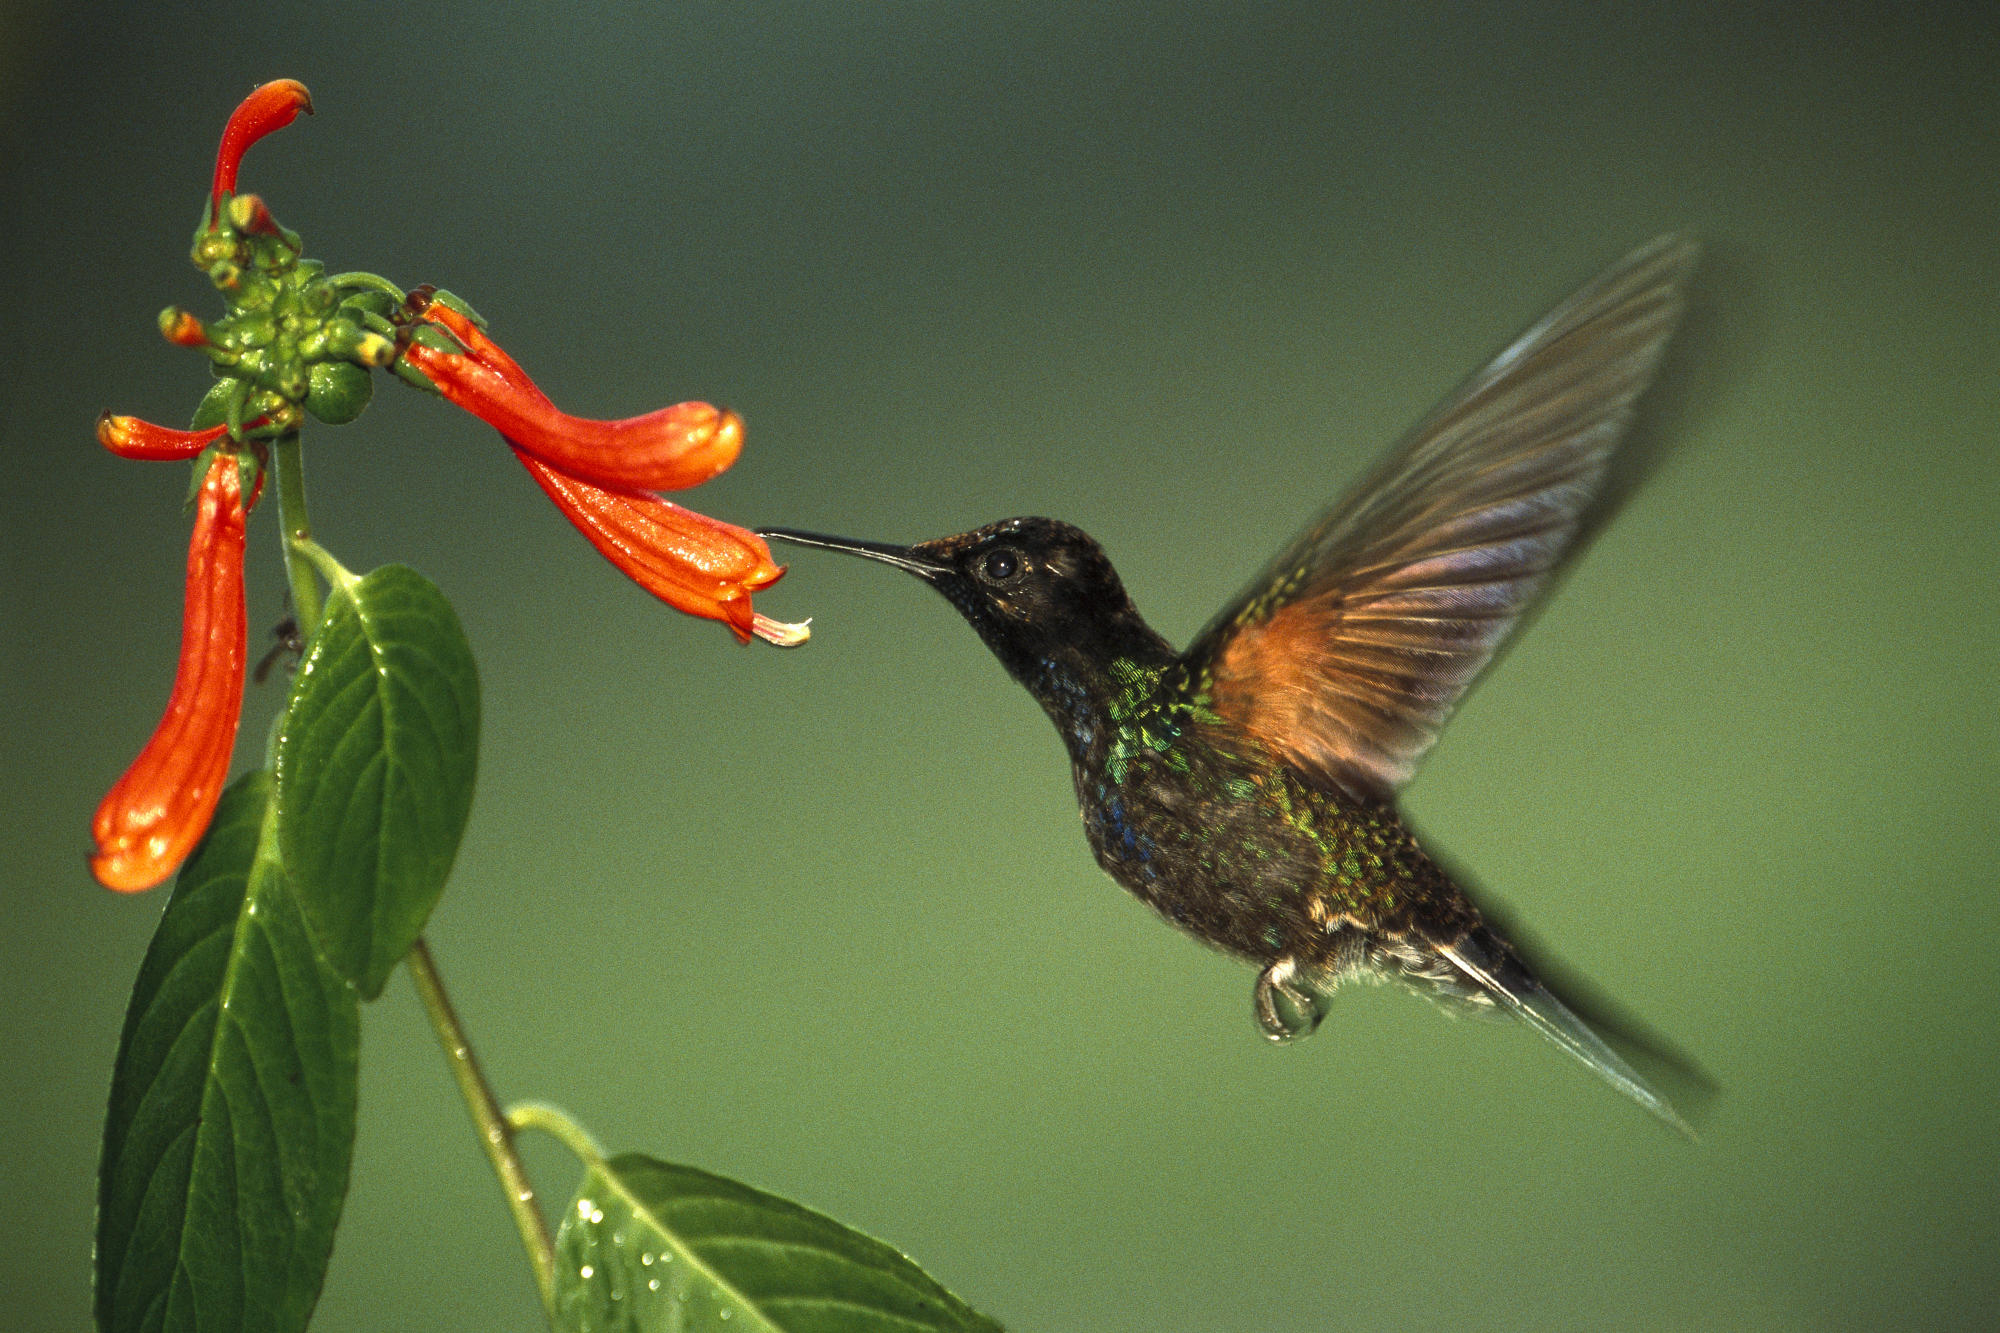 kolibri_1101018_2357.jpg